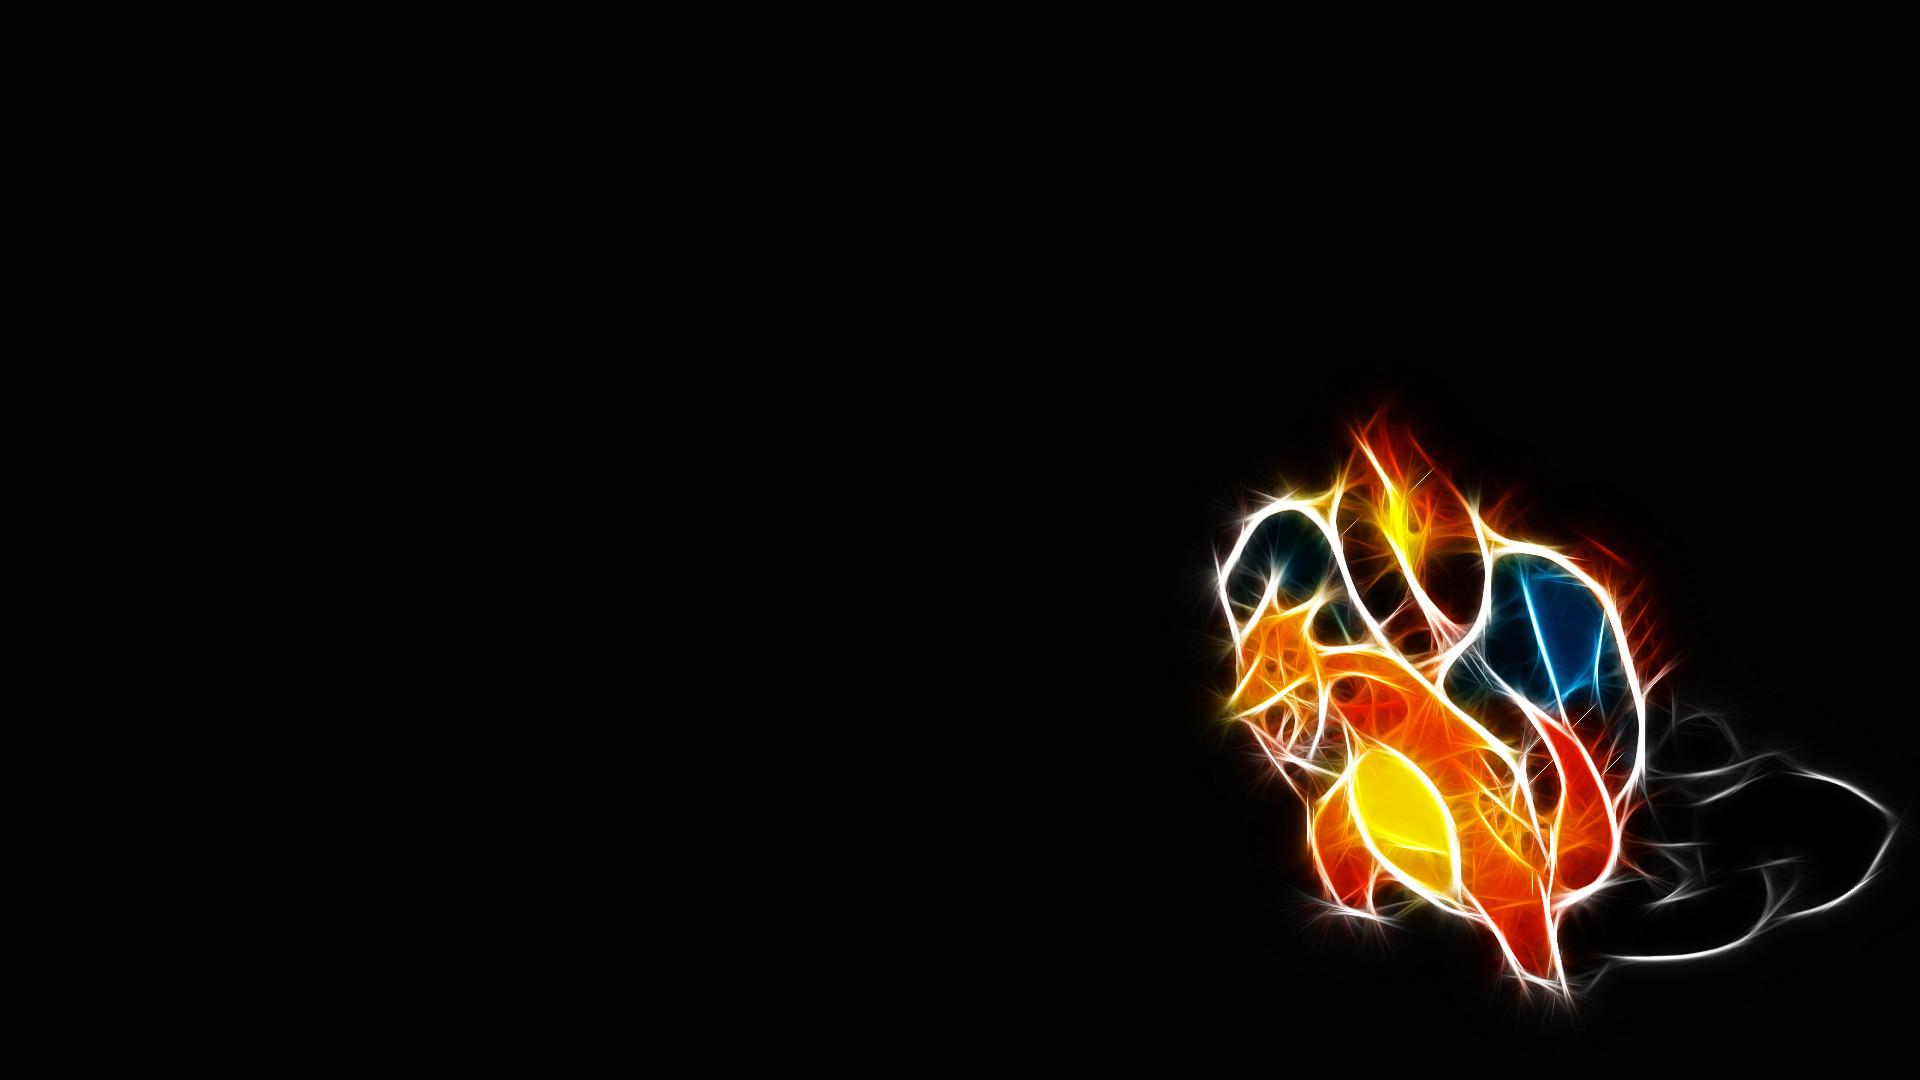 Pokemon Charizard Background HD.